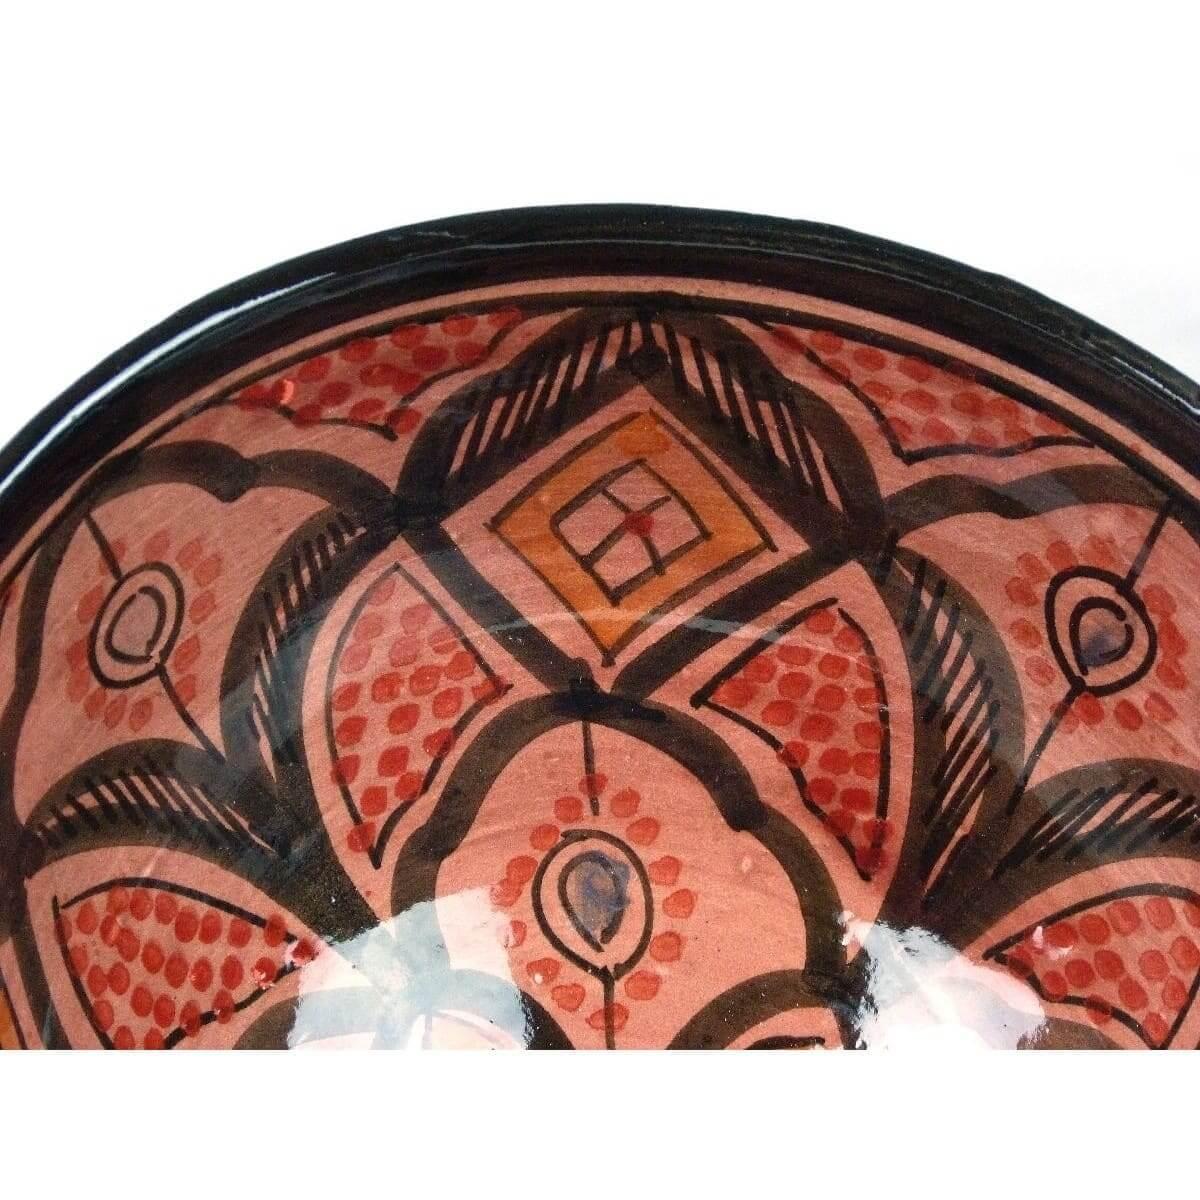 orientalische marokkanische keramikschale keramik obst salat reis schale gro ebay. Black Bedroom Furniture Sets. Home Design Ideas